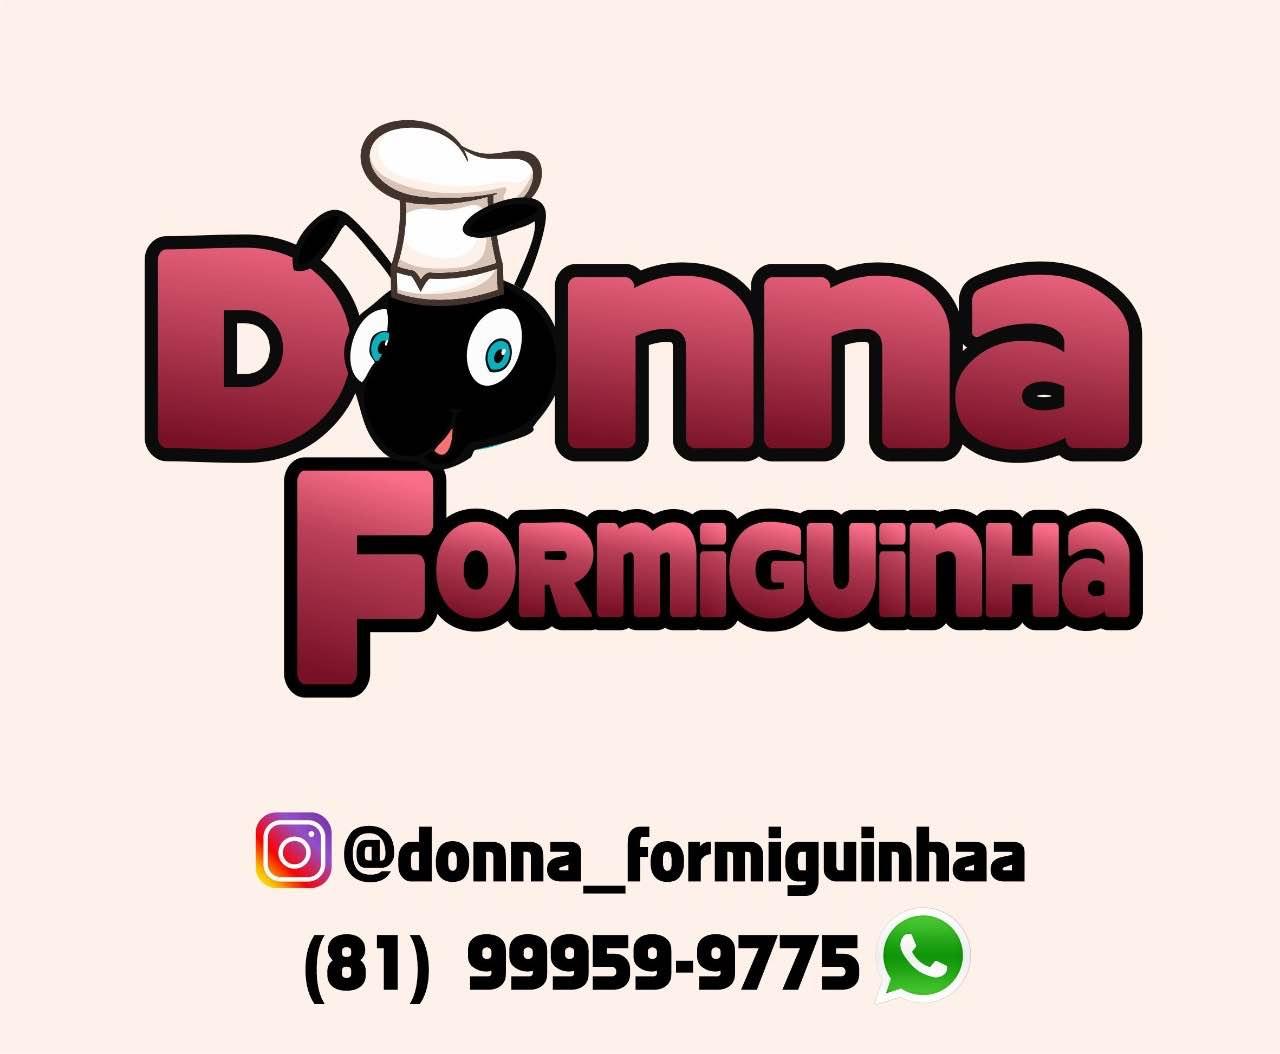 Donna Formiguinhaa